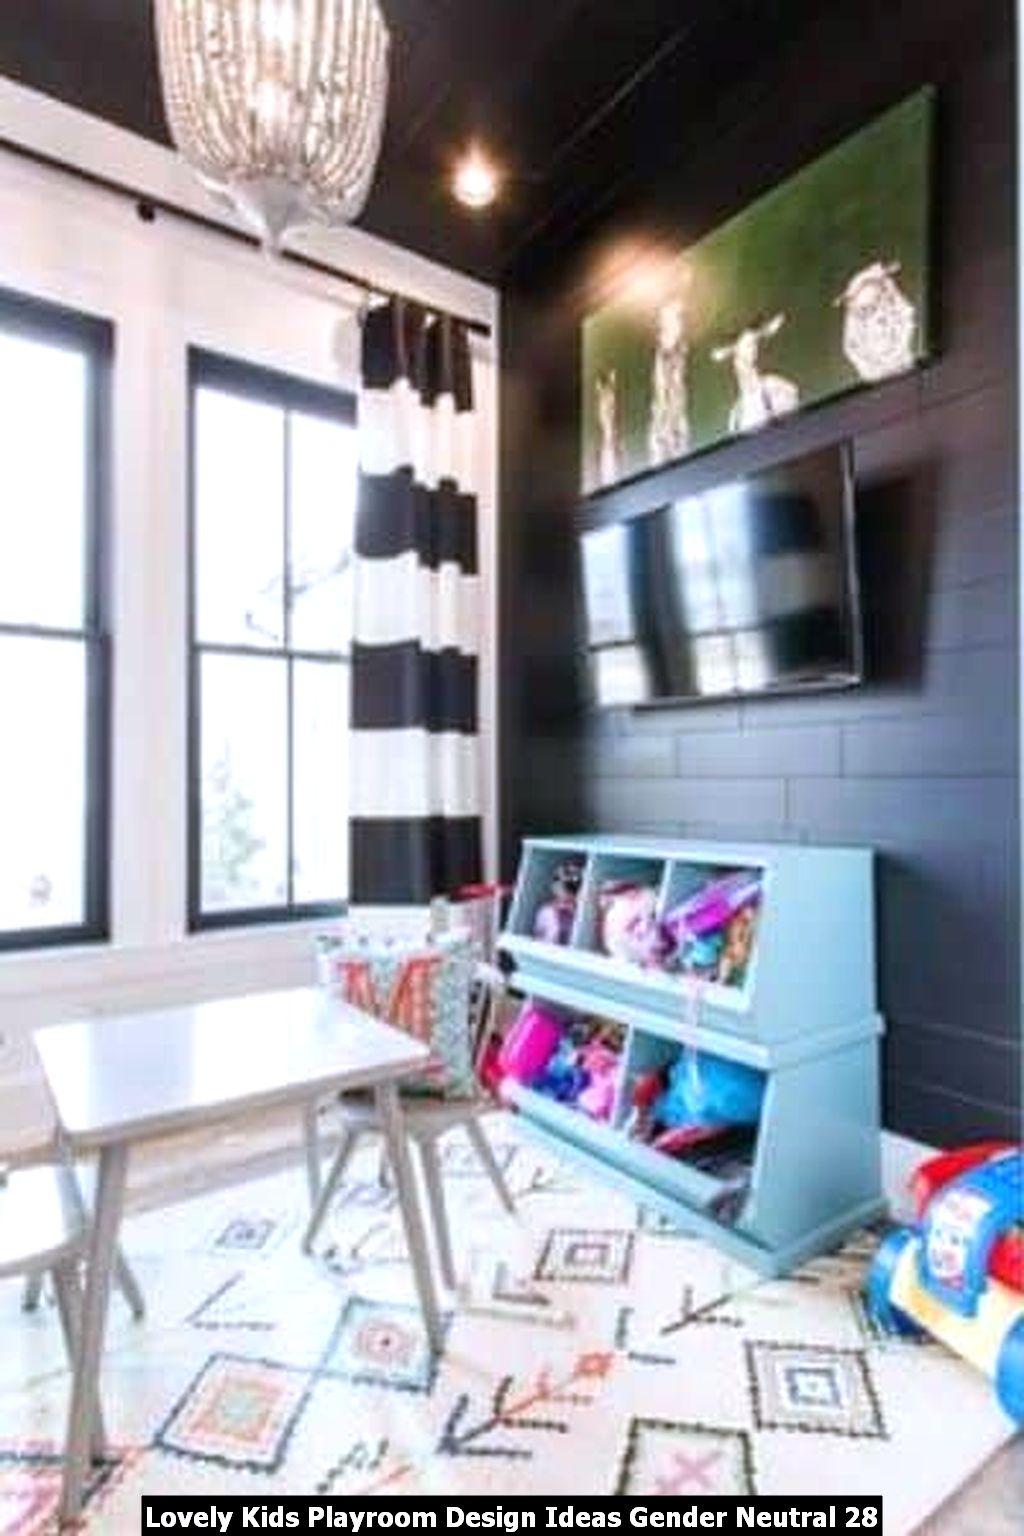 Lovely Kids Playroom Design Ideas Gender Neutral 28